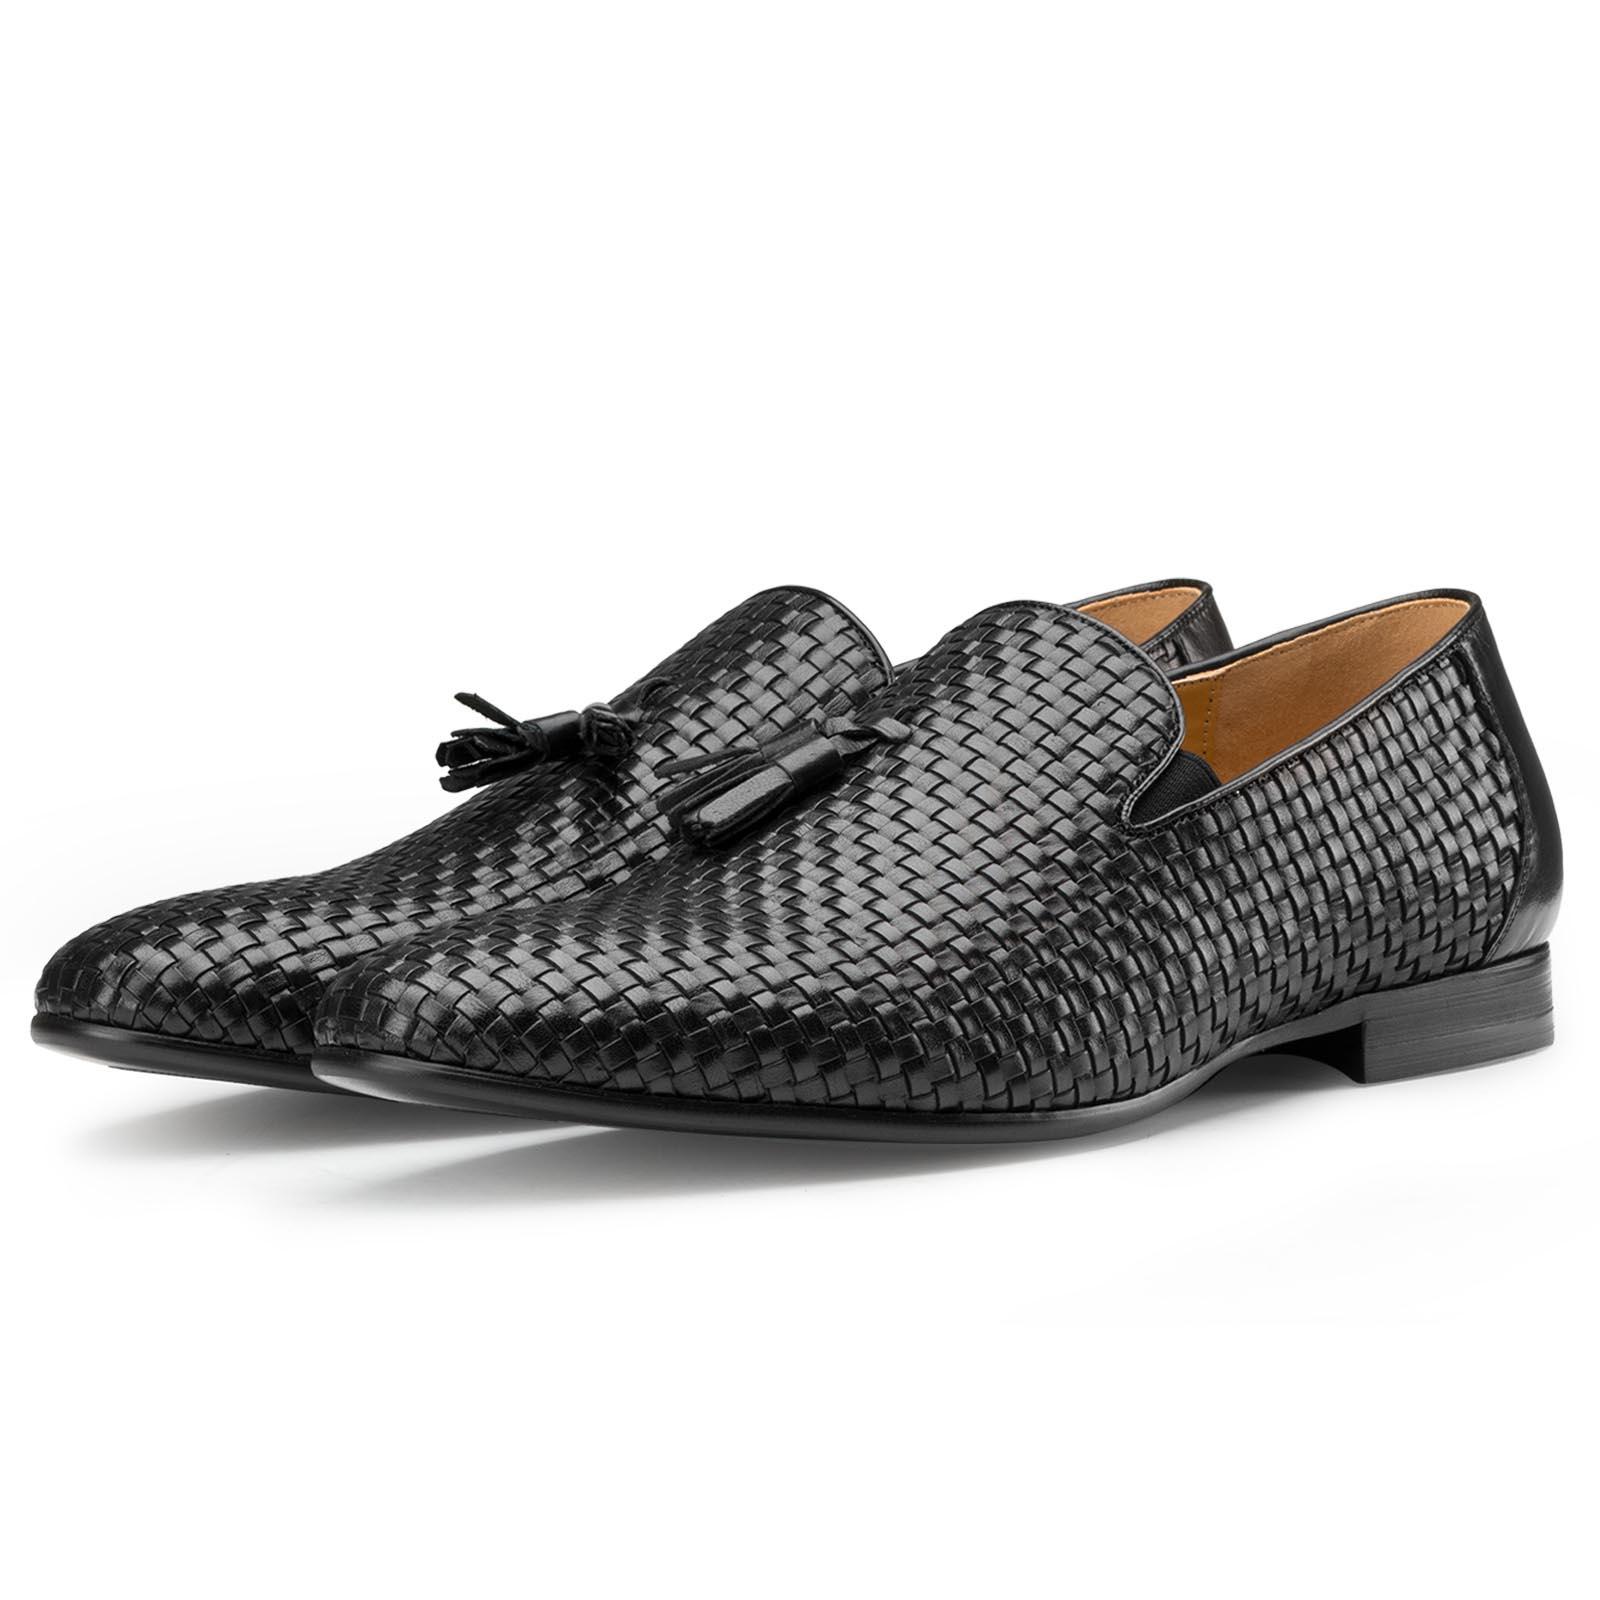 Black Weaved Tassel Loafers